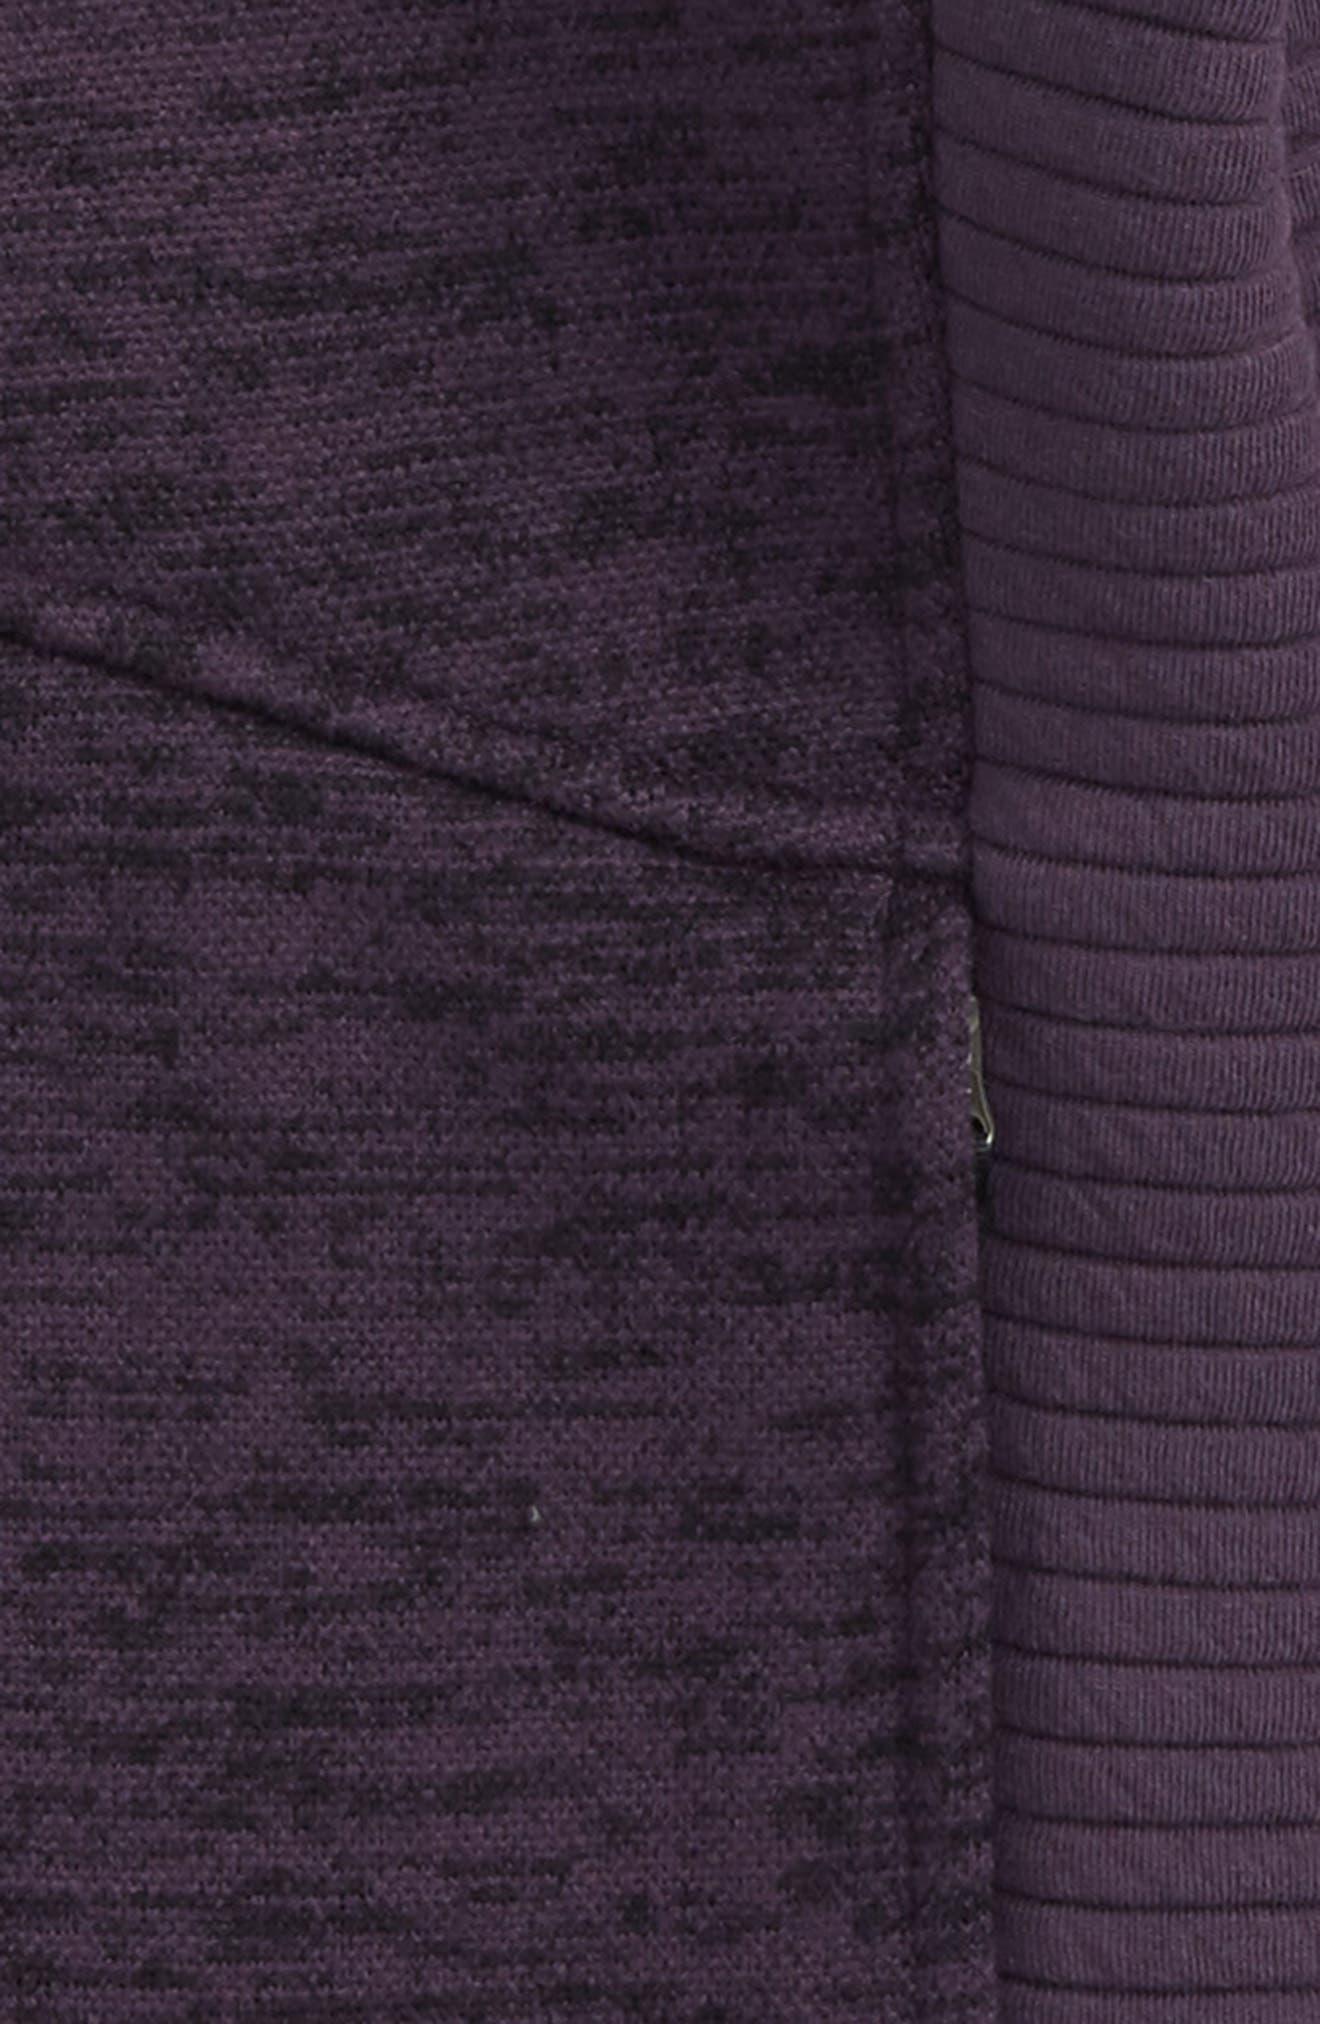 Indi 2 Hooded Knit Parka,                             Alternate thumbnail 2, color,                             Dark Eggplant Purple